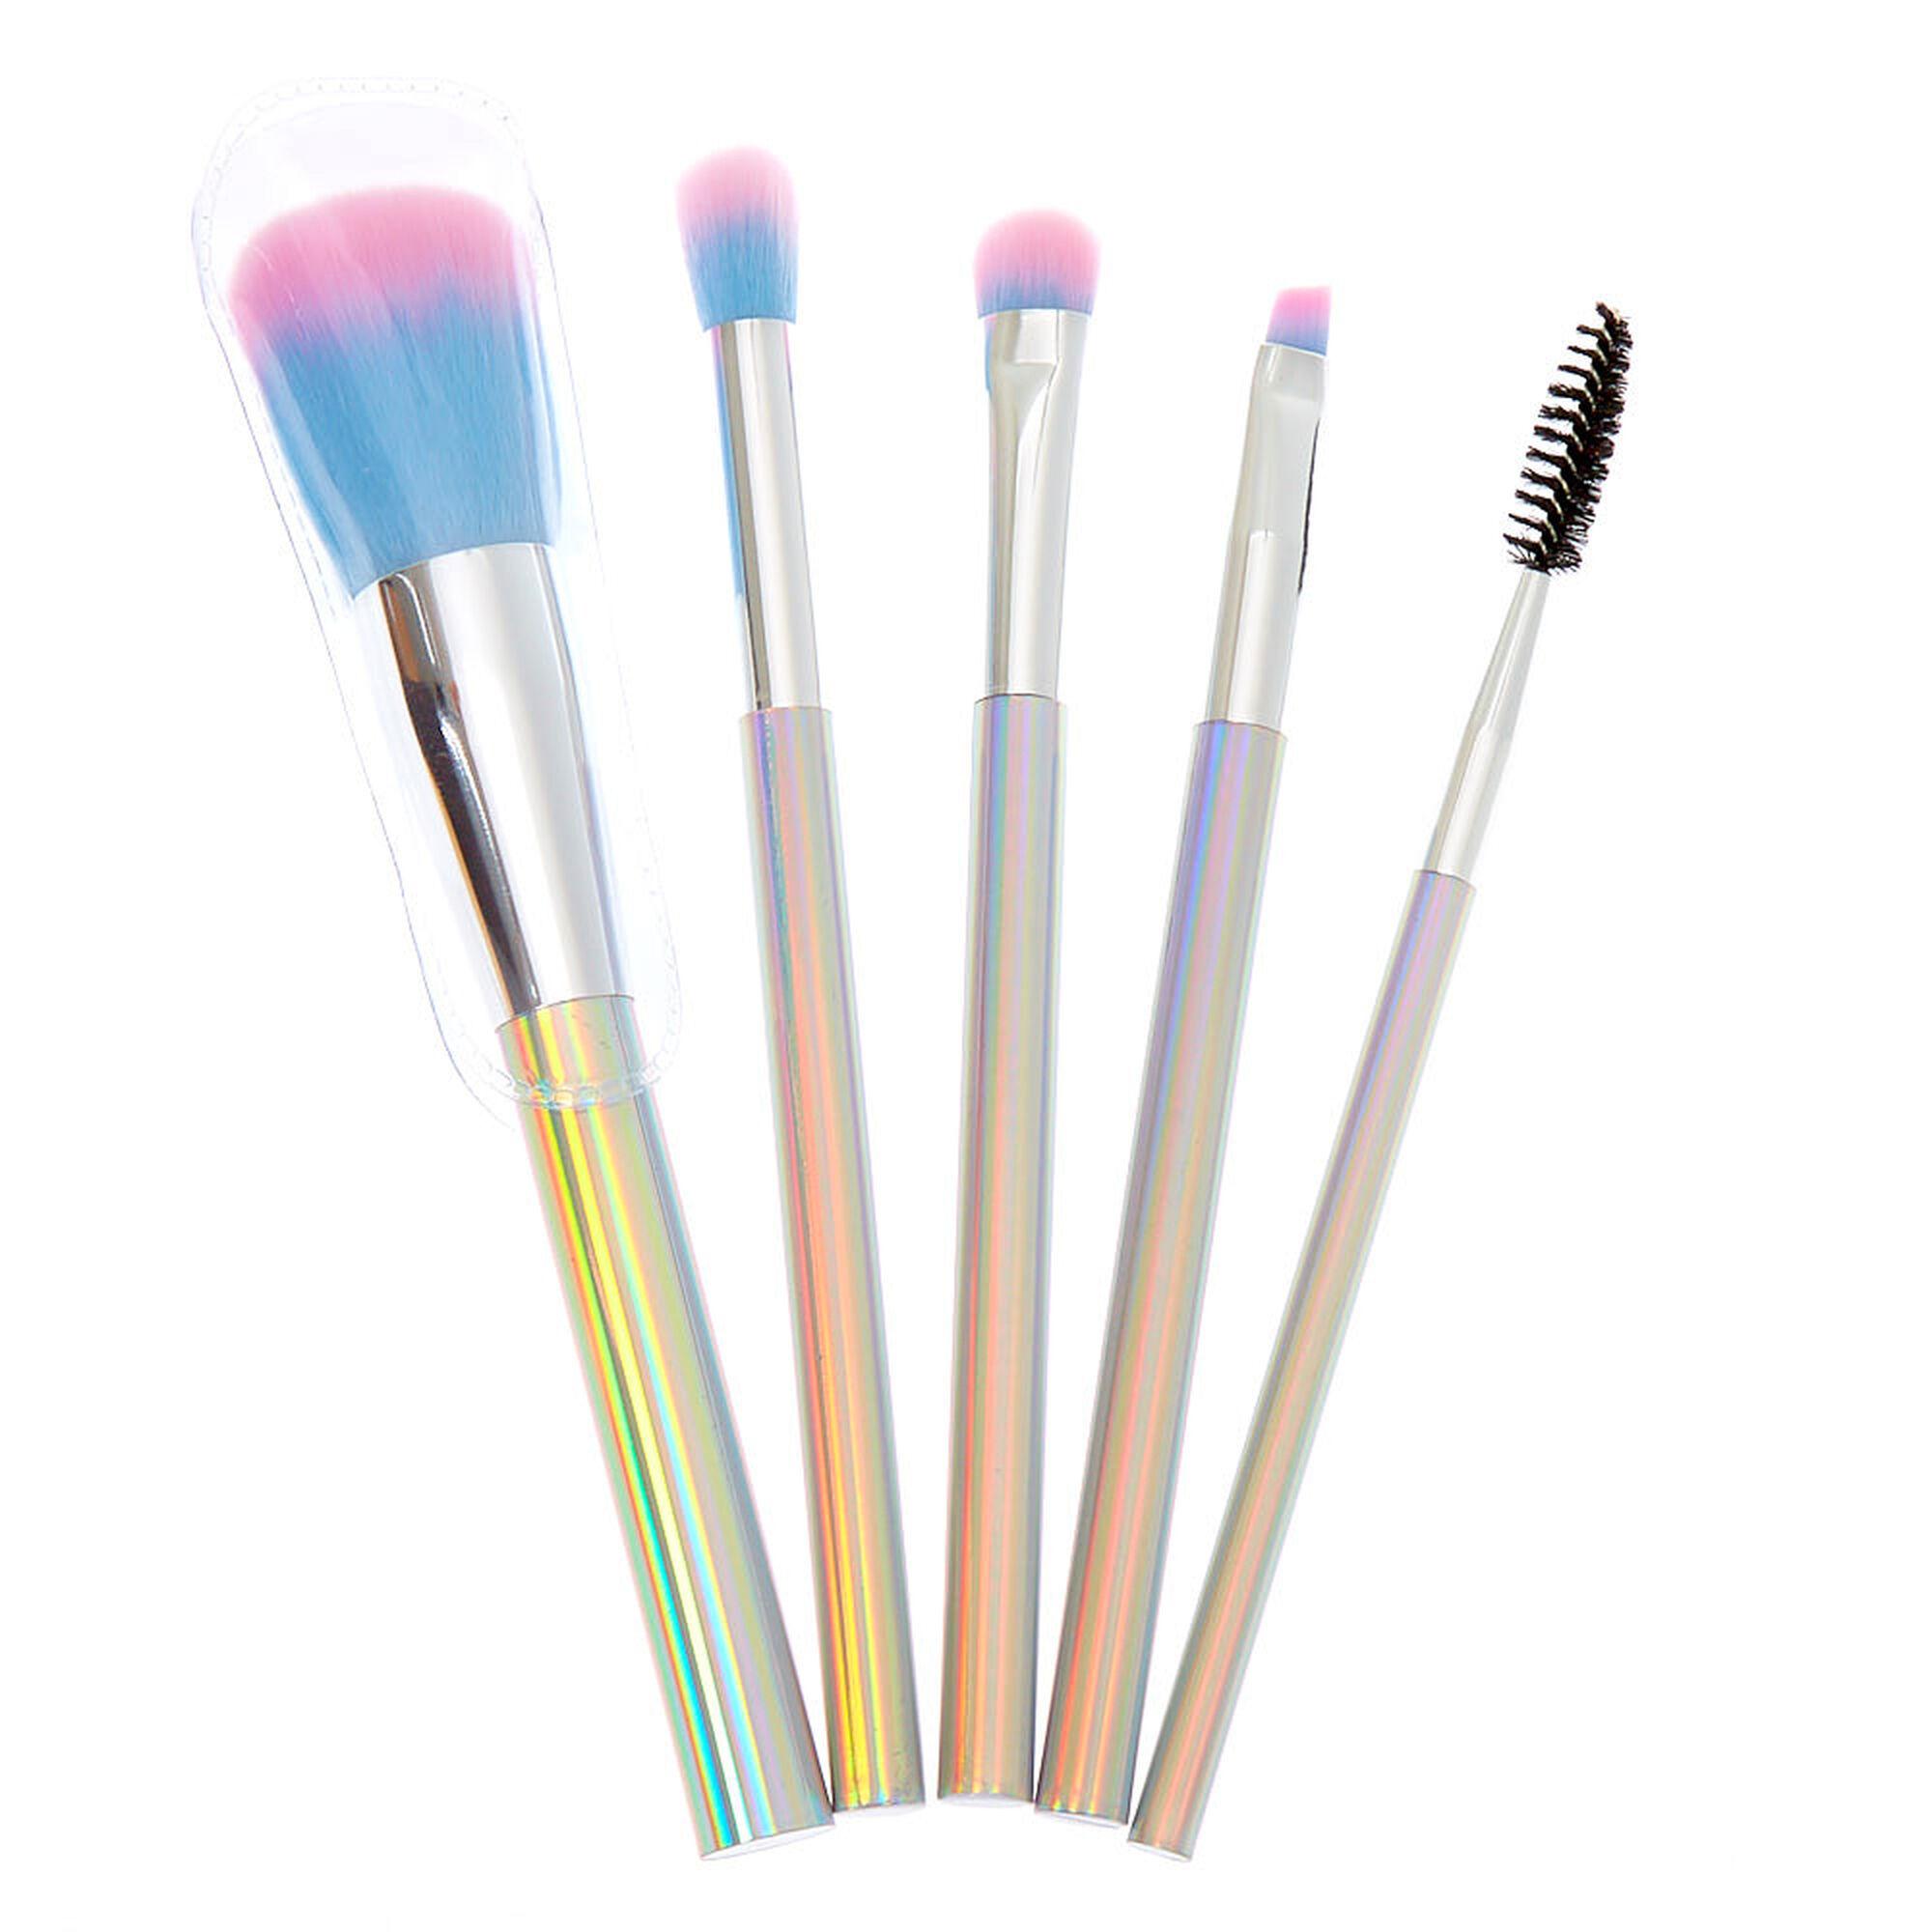 Holographic Makeup Brush Set - 5 Pack